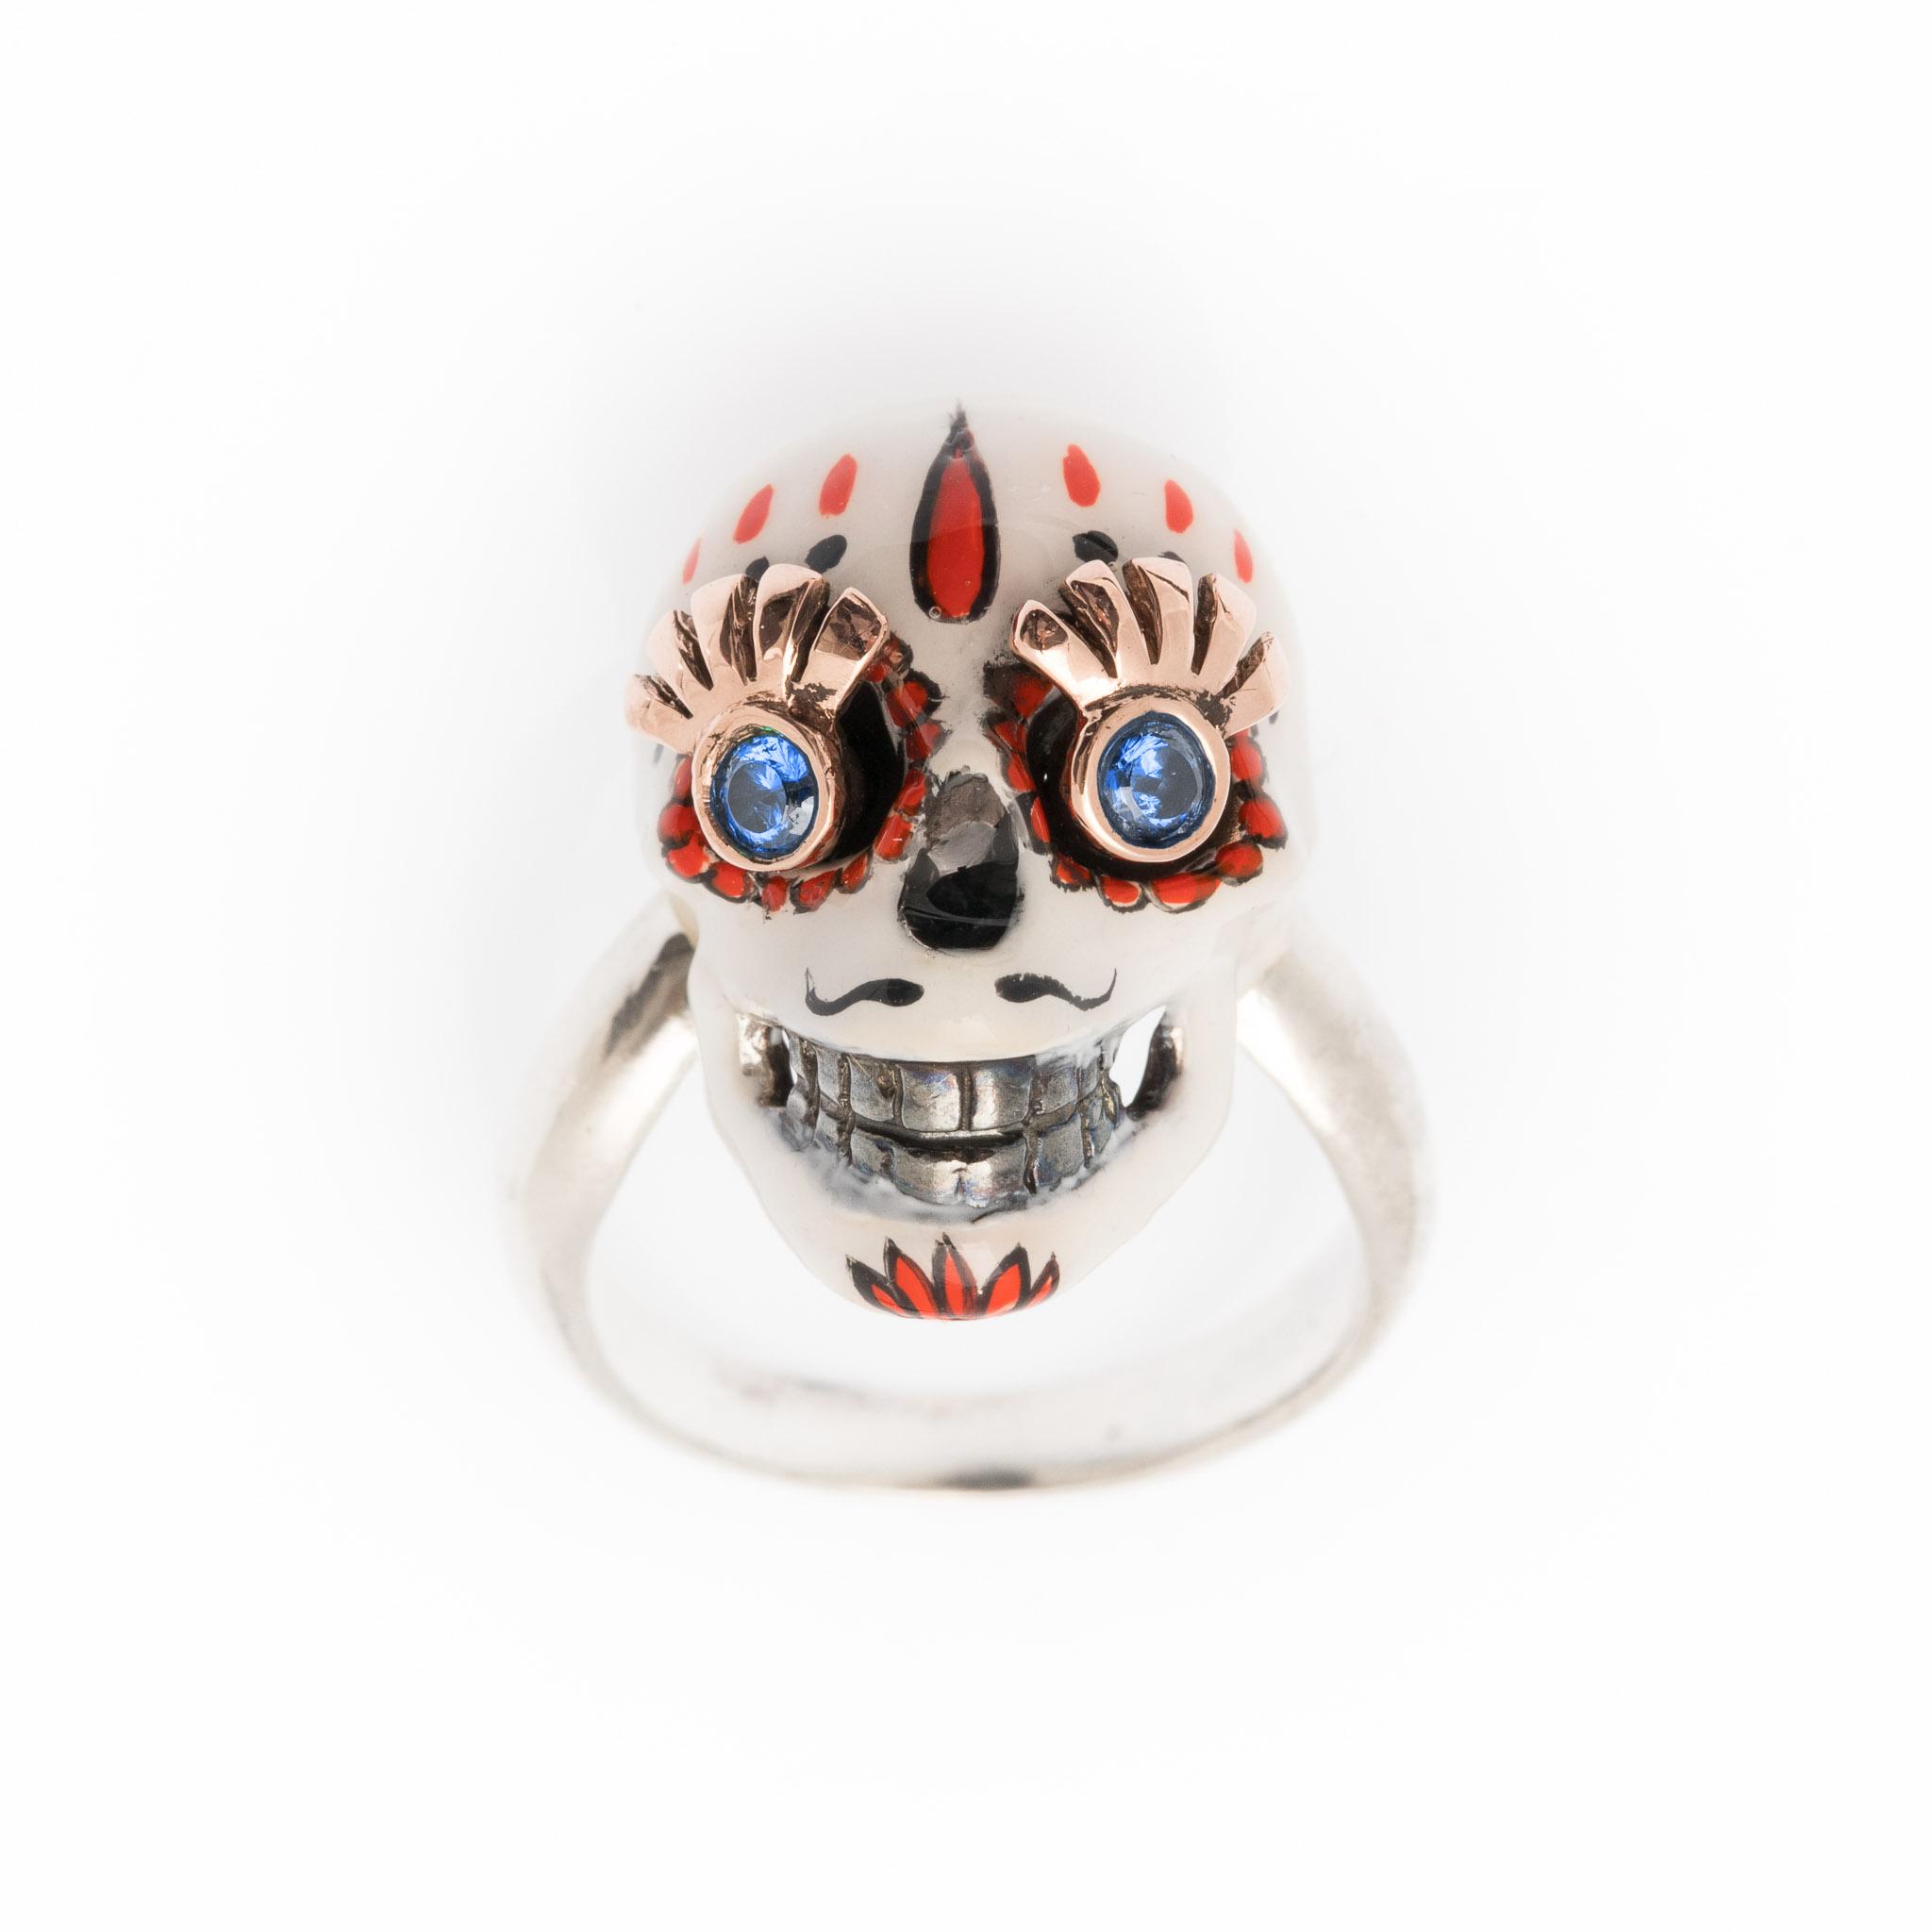 Anello divina skull catrina teschio messicano_1 rosa_blu (1)